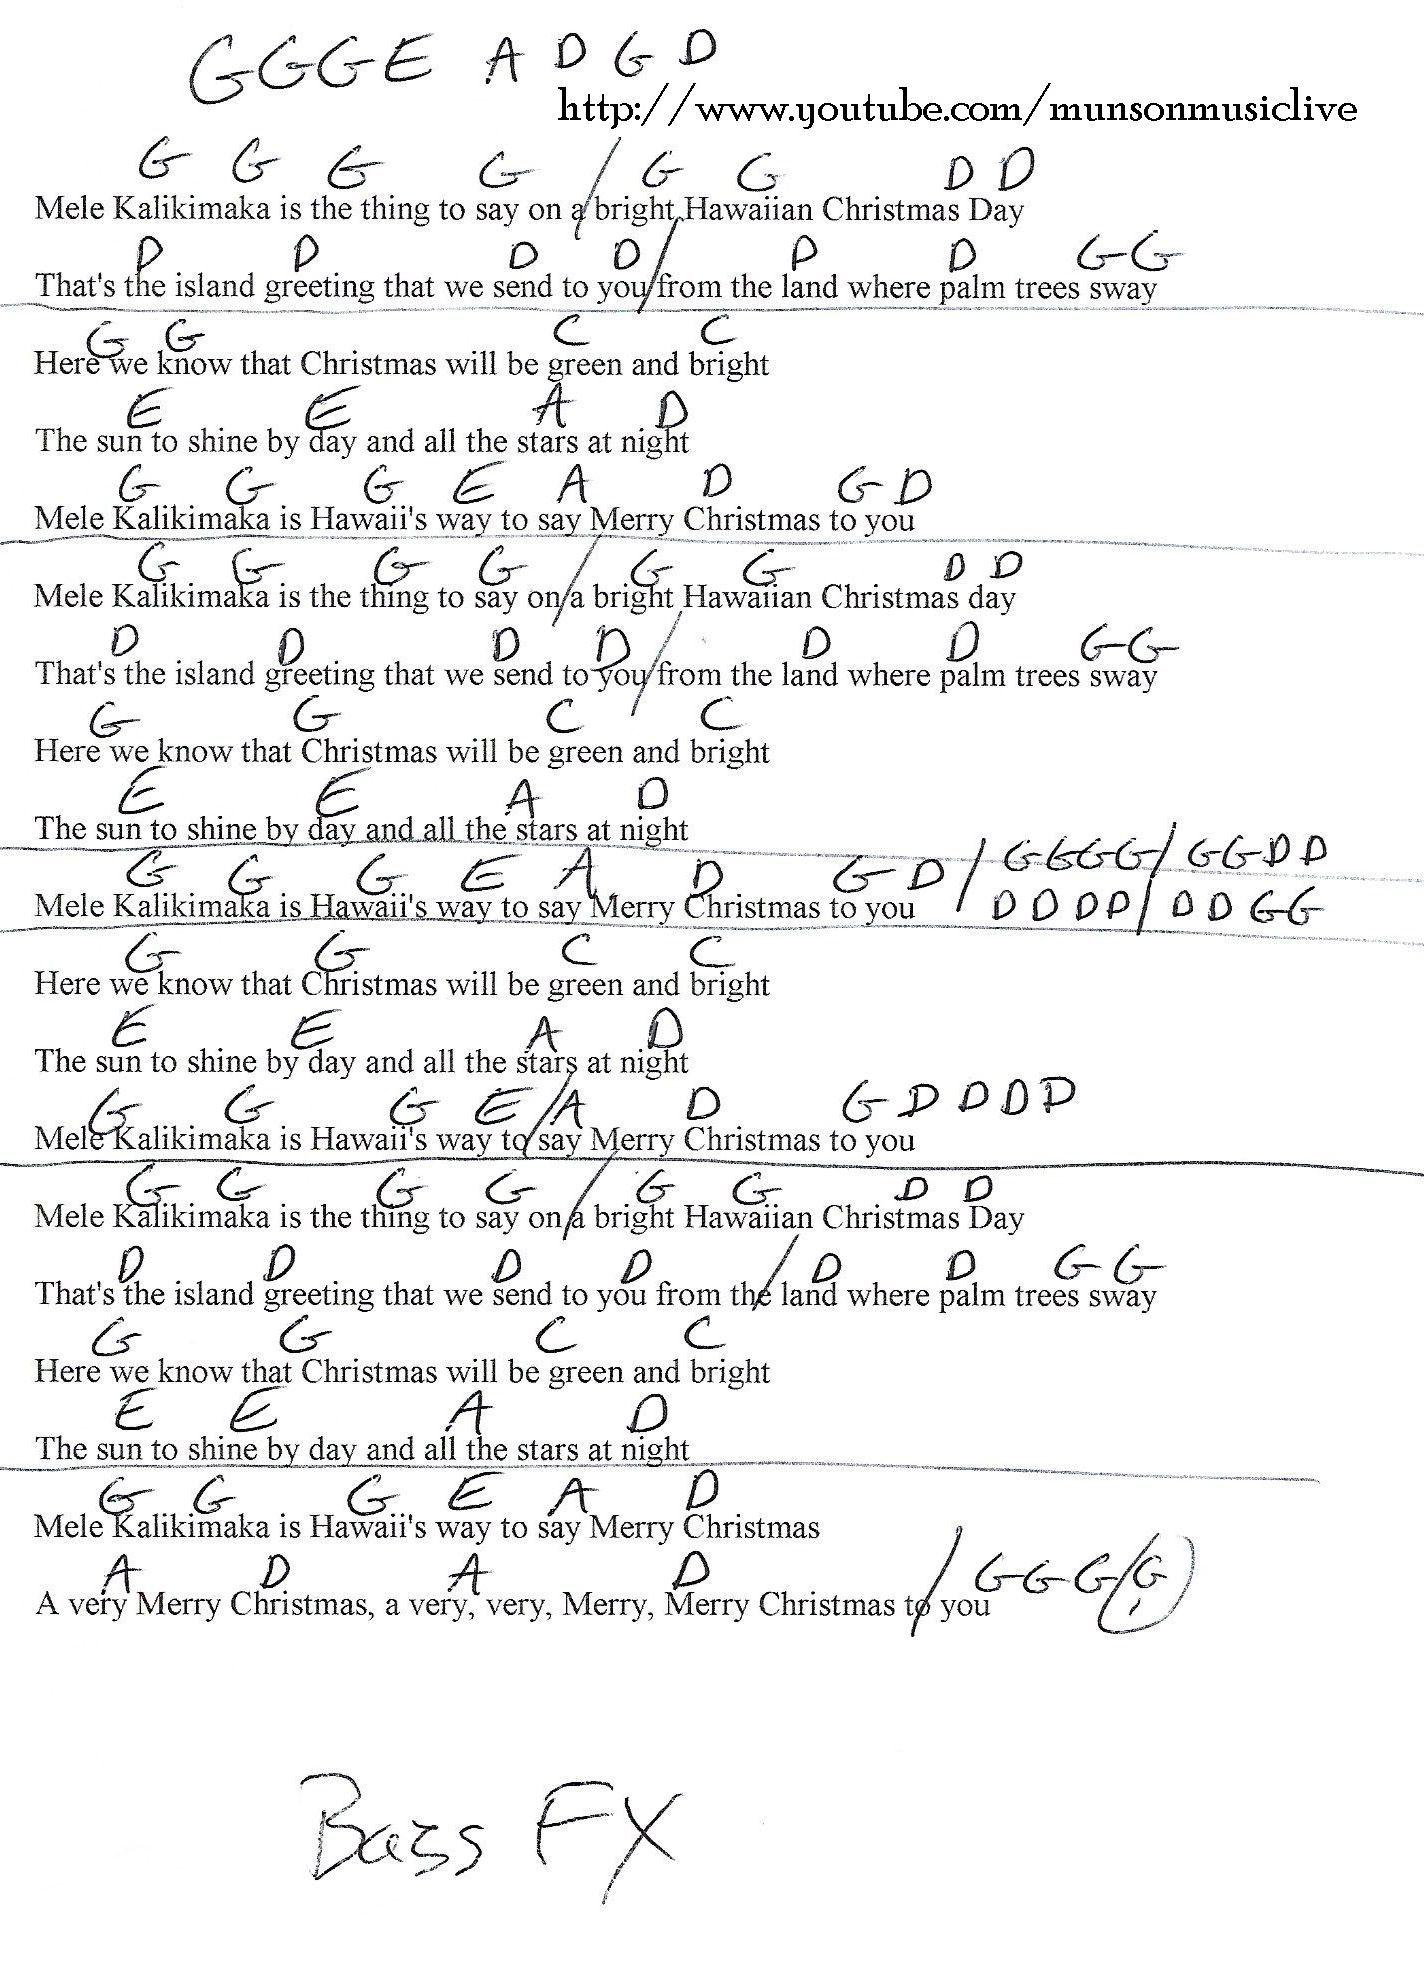 Mele Kalikimaka Guitar Chord Chart In G Guitar Lessons